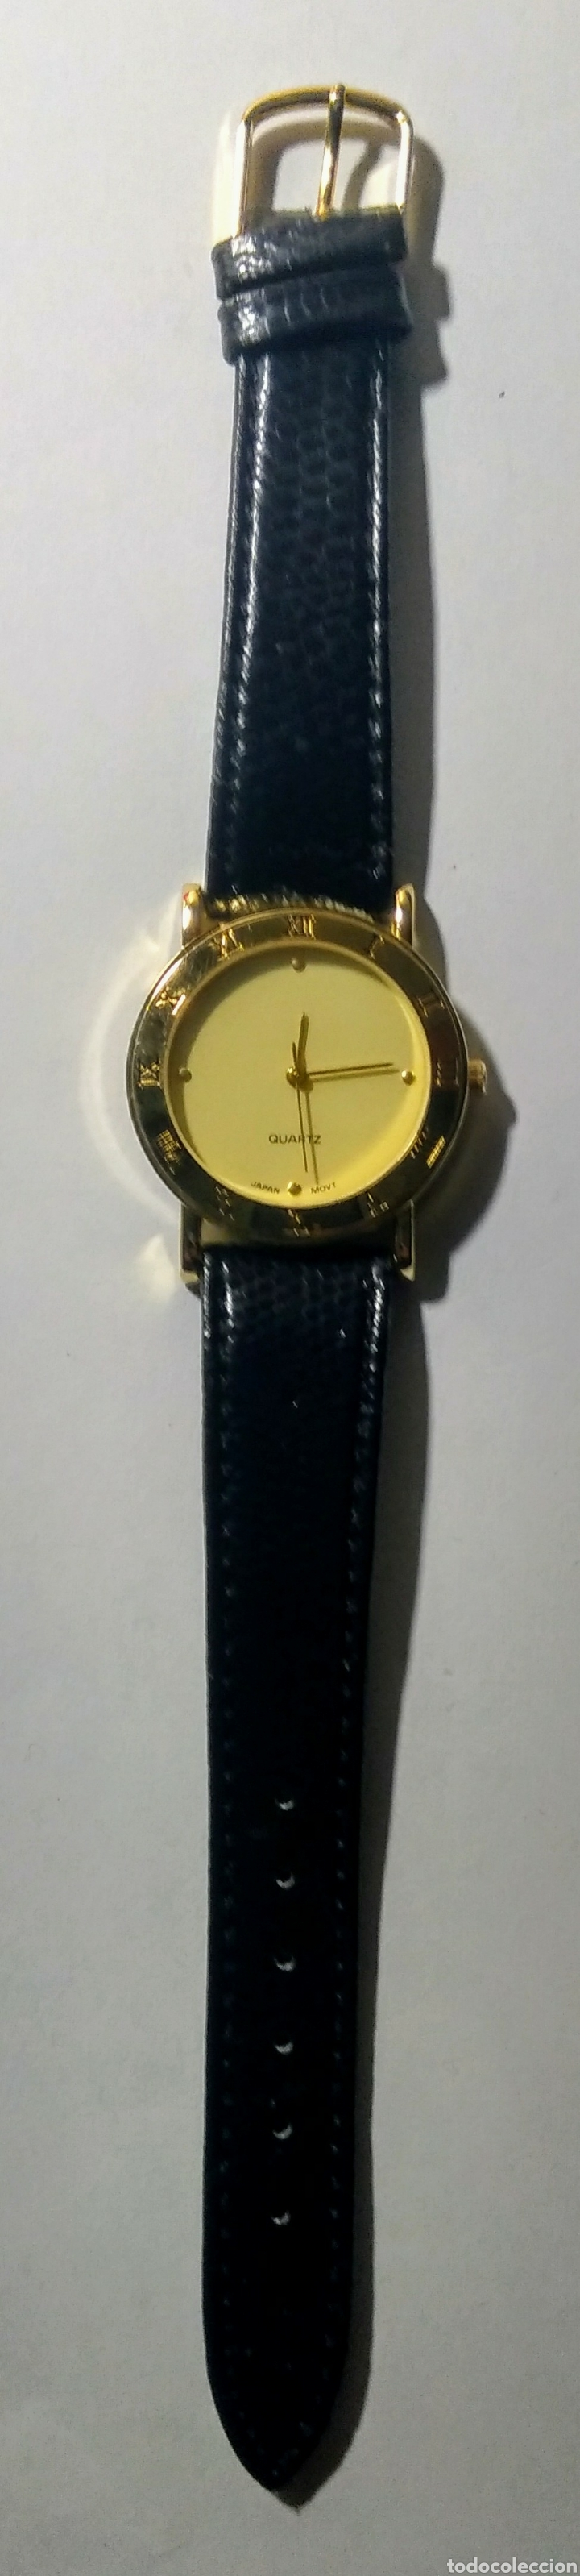 Relojes: Reloj Quartz. Japan Movt. Correa de piel. - Foto 2 - 187543792